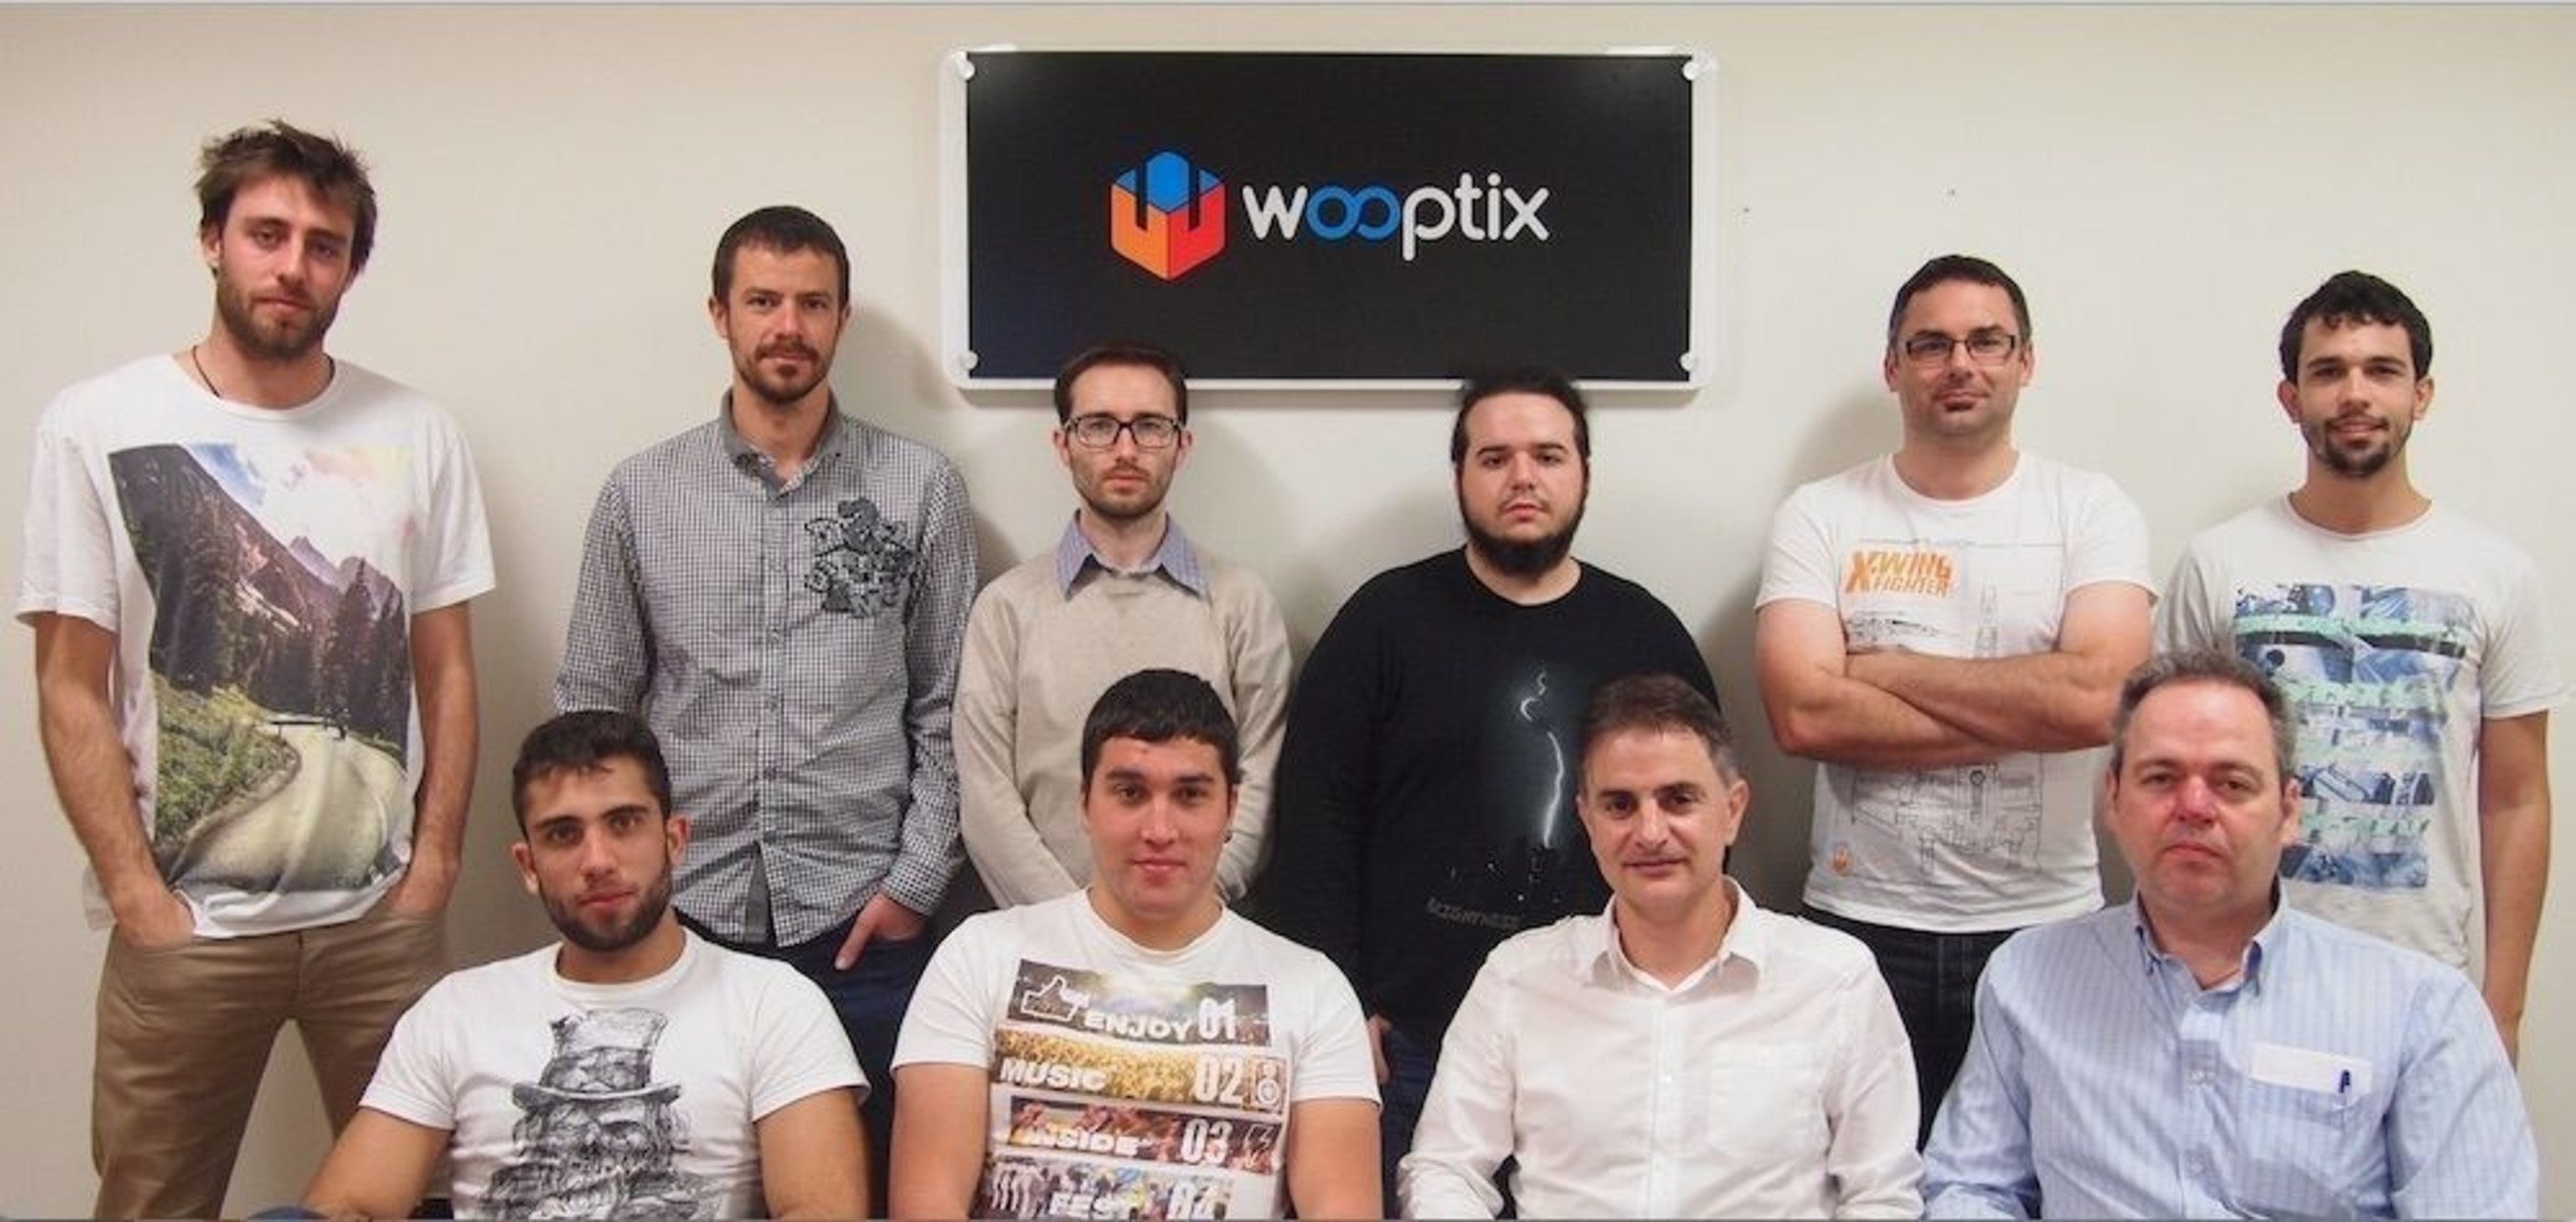 Wooptix Team